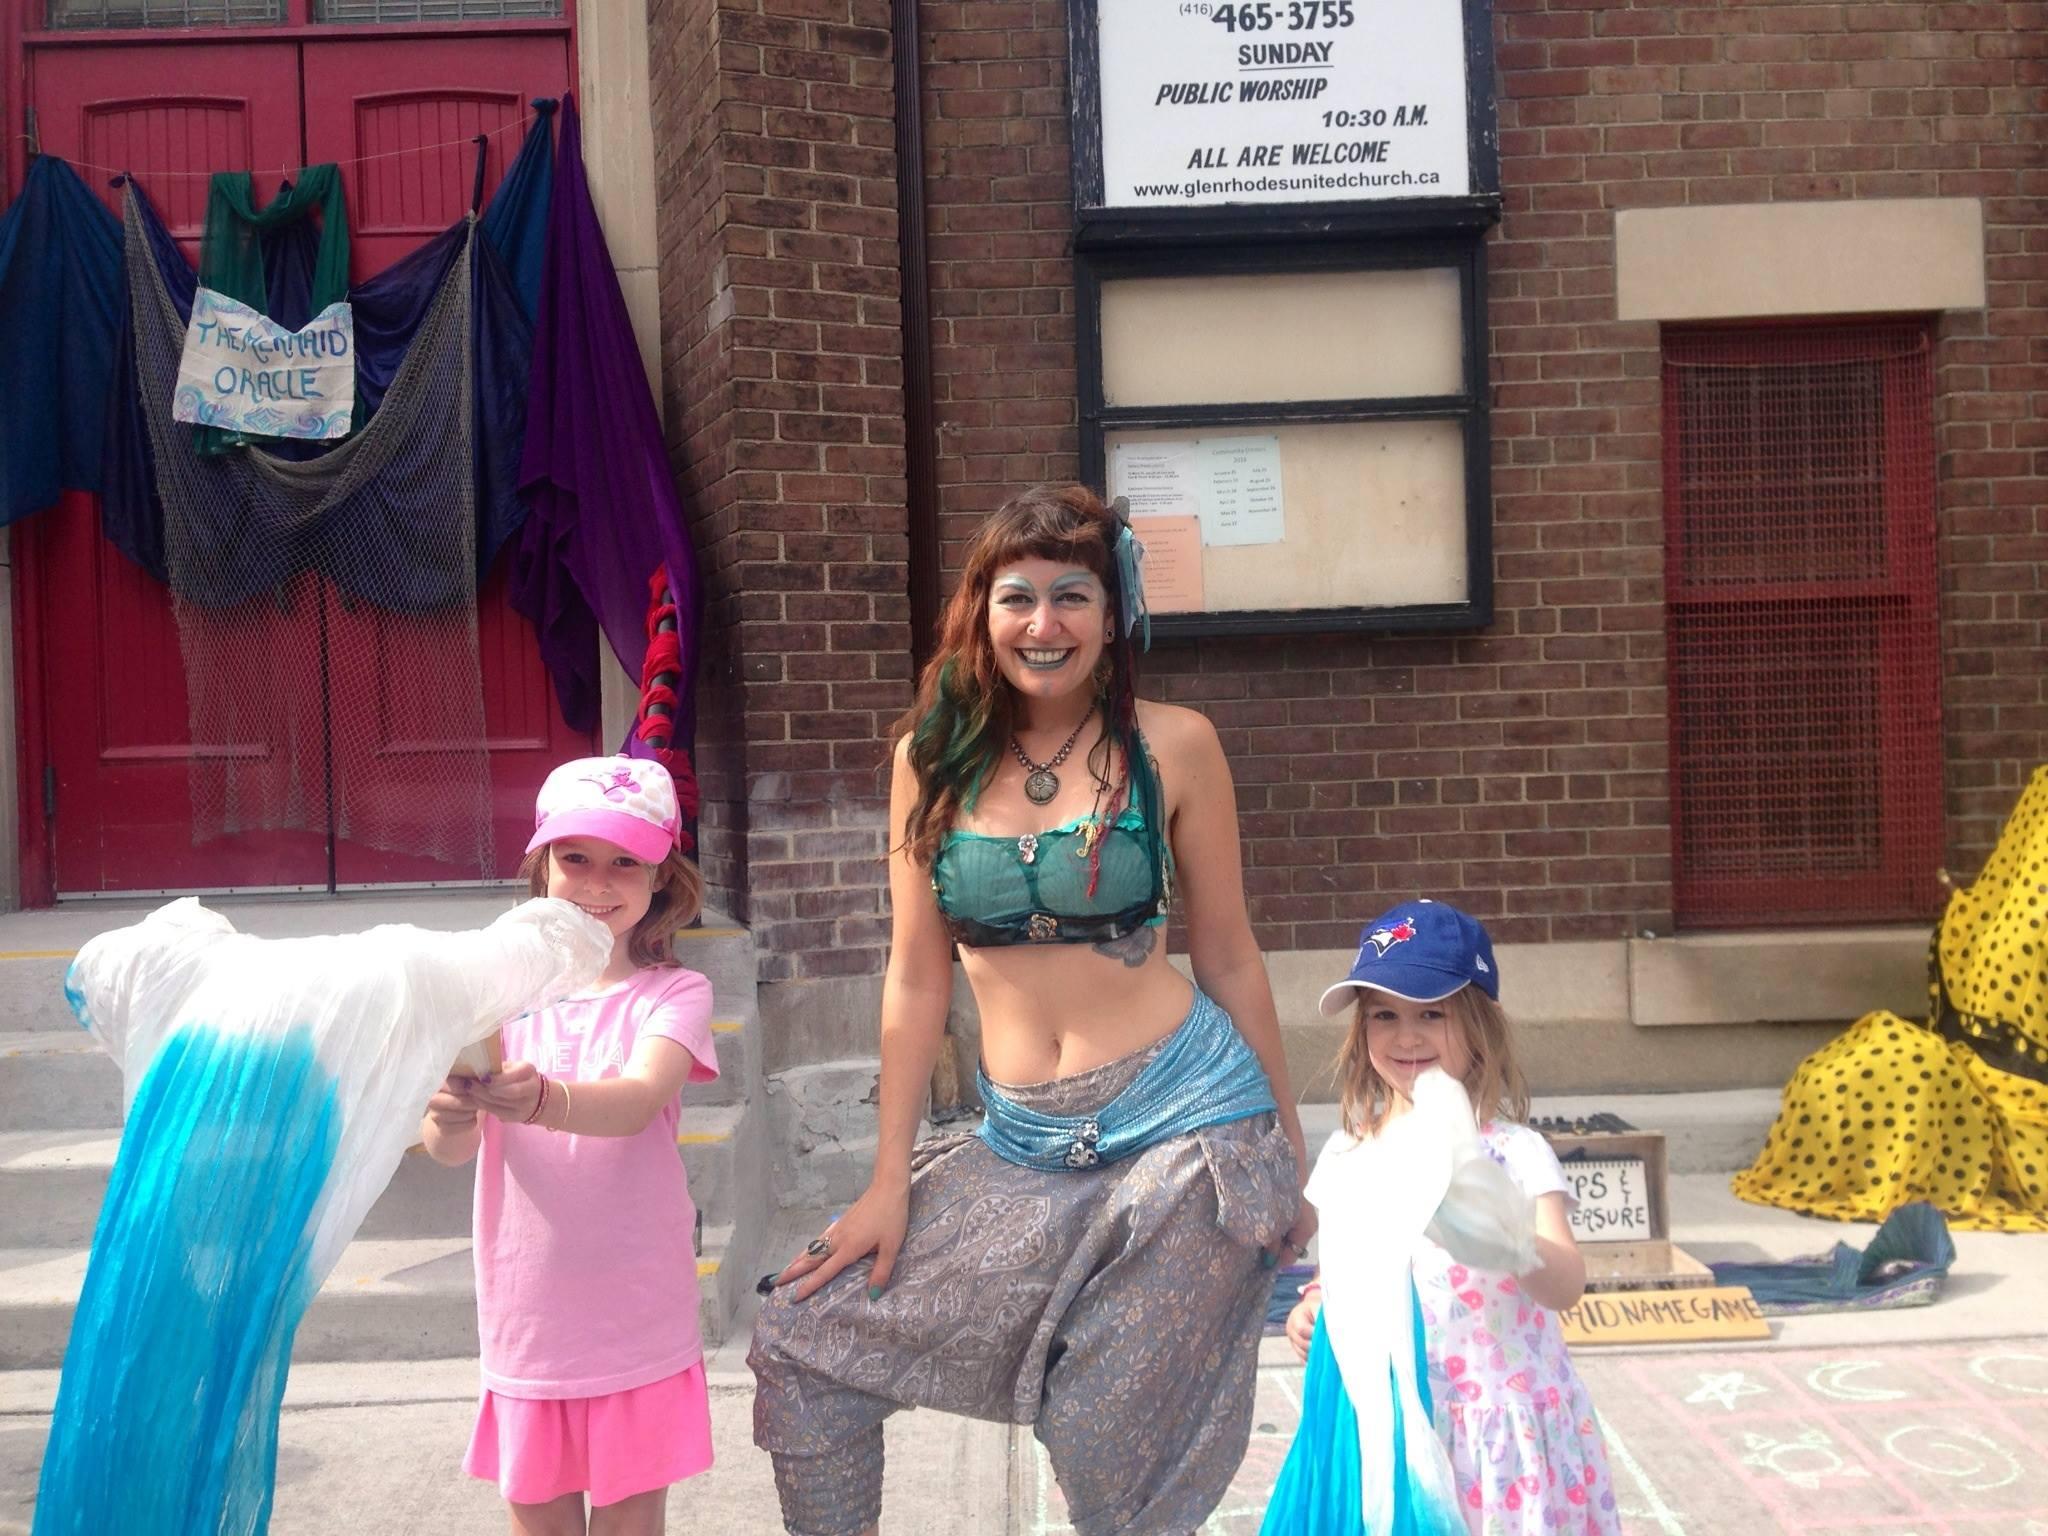 Mermaid initiation